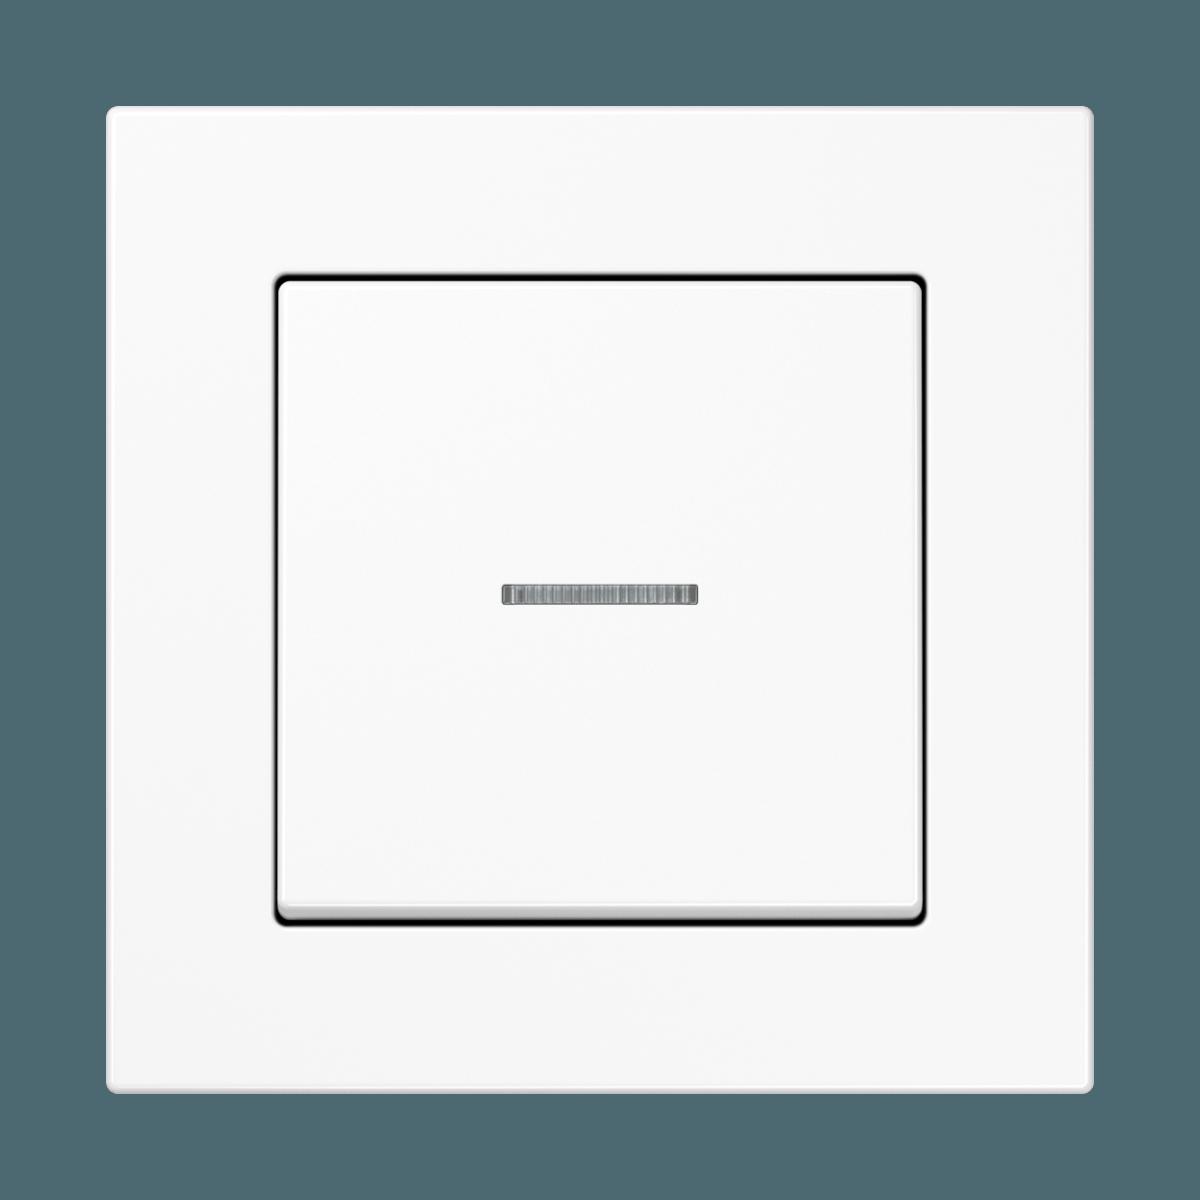 Variasi A 550 White Series  LightingInterior LightingLighting Components 1